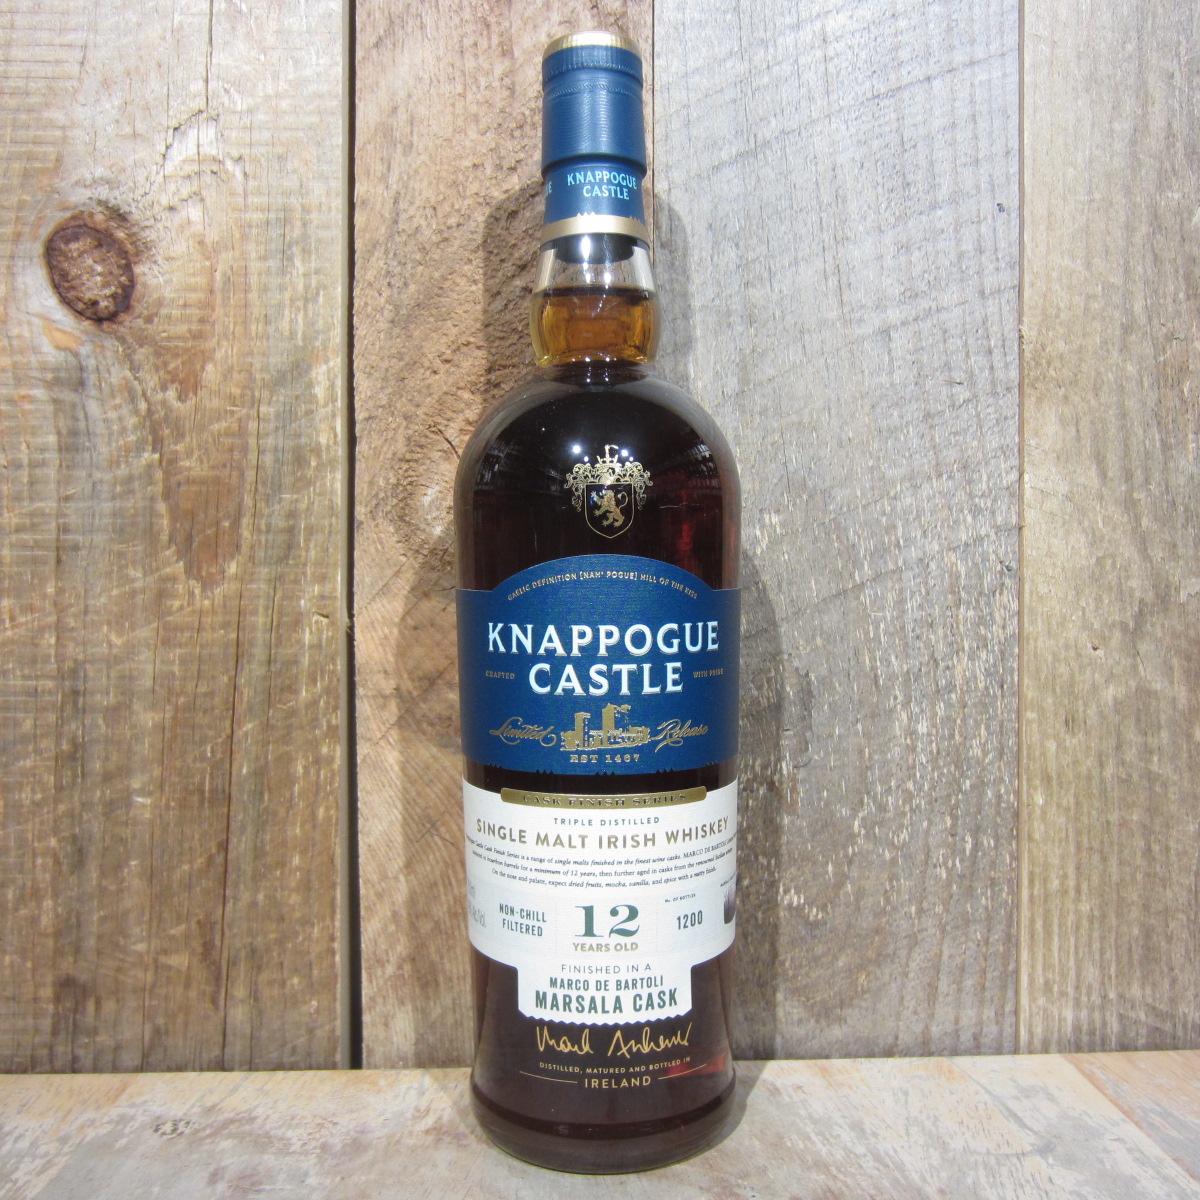 Knappogue Castle 12 Year Old Marsala Cask Irish Whiskey 750ml